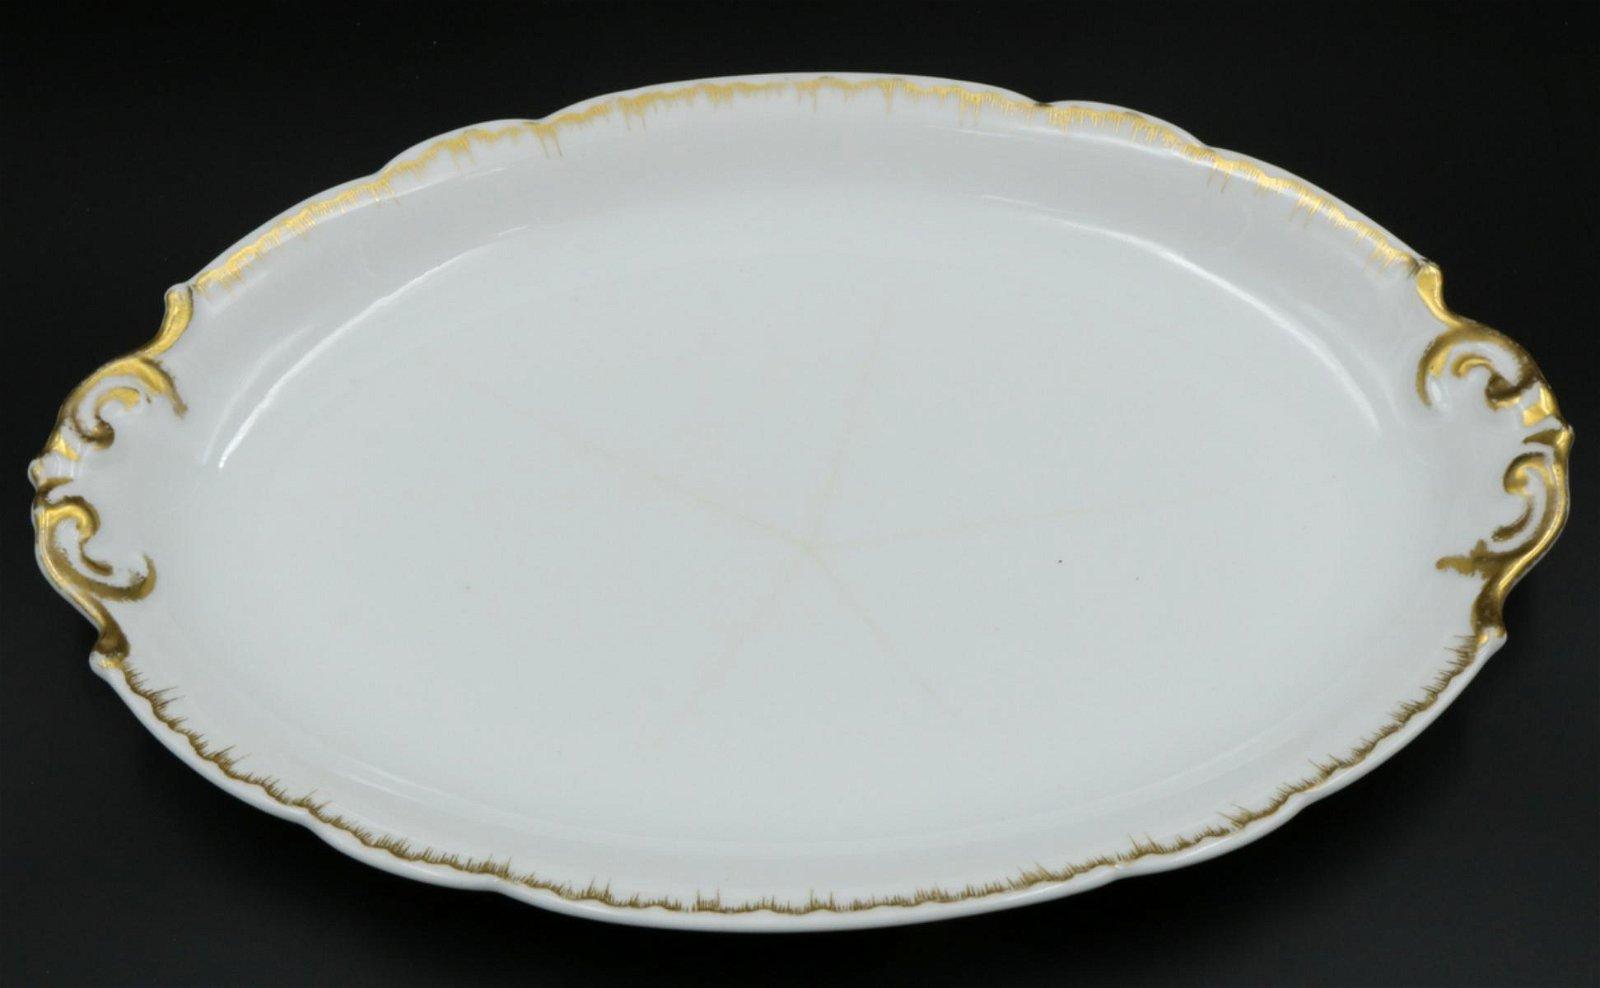 L. Bernardaud & Co. Porcelain Serving Plate